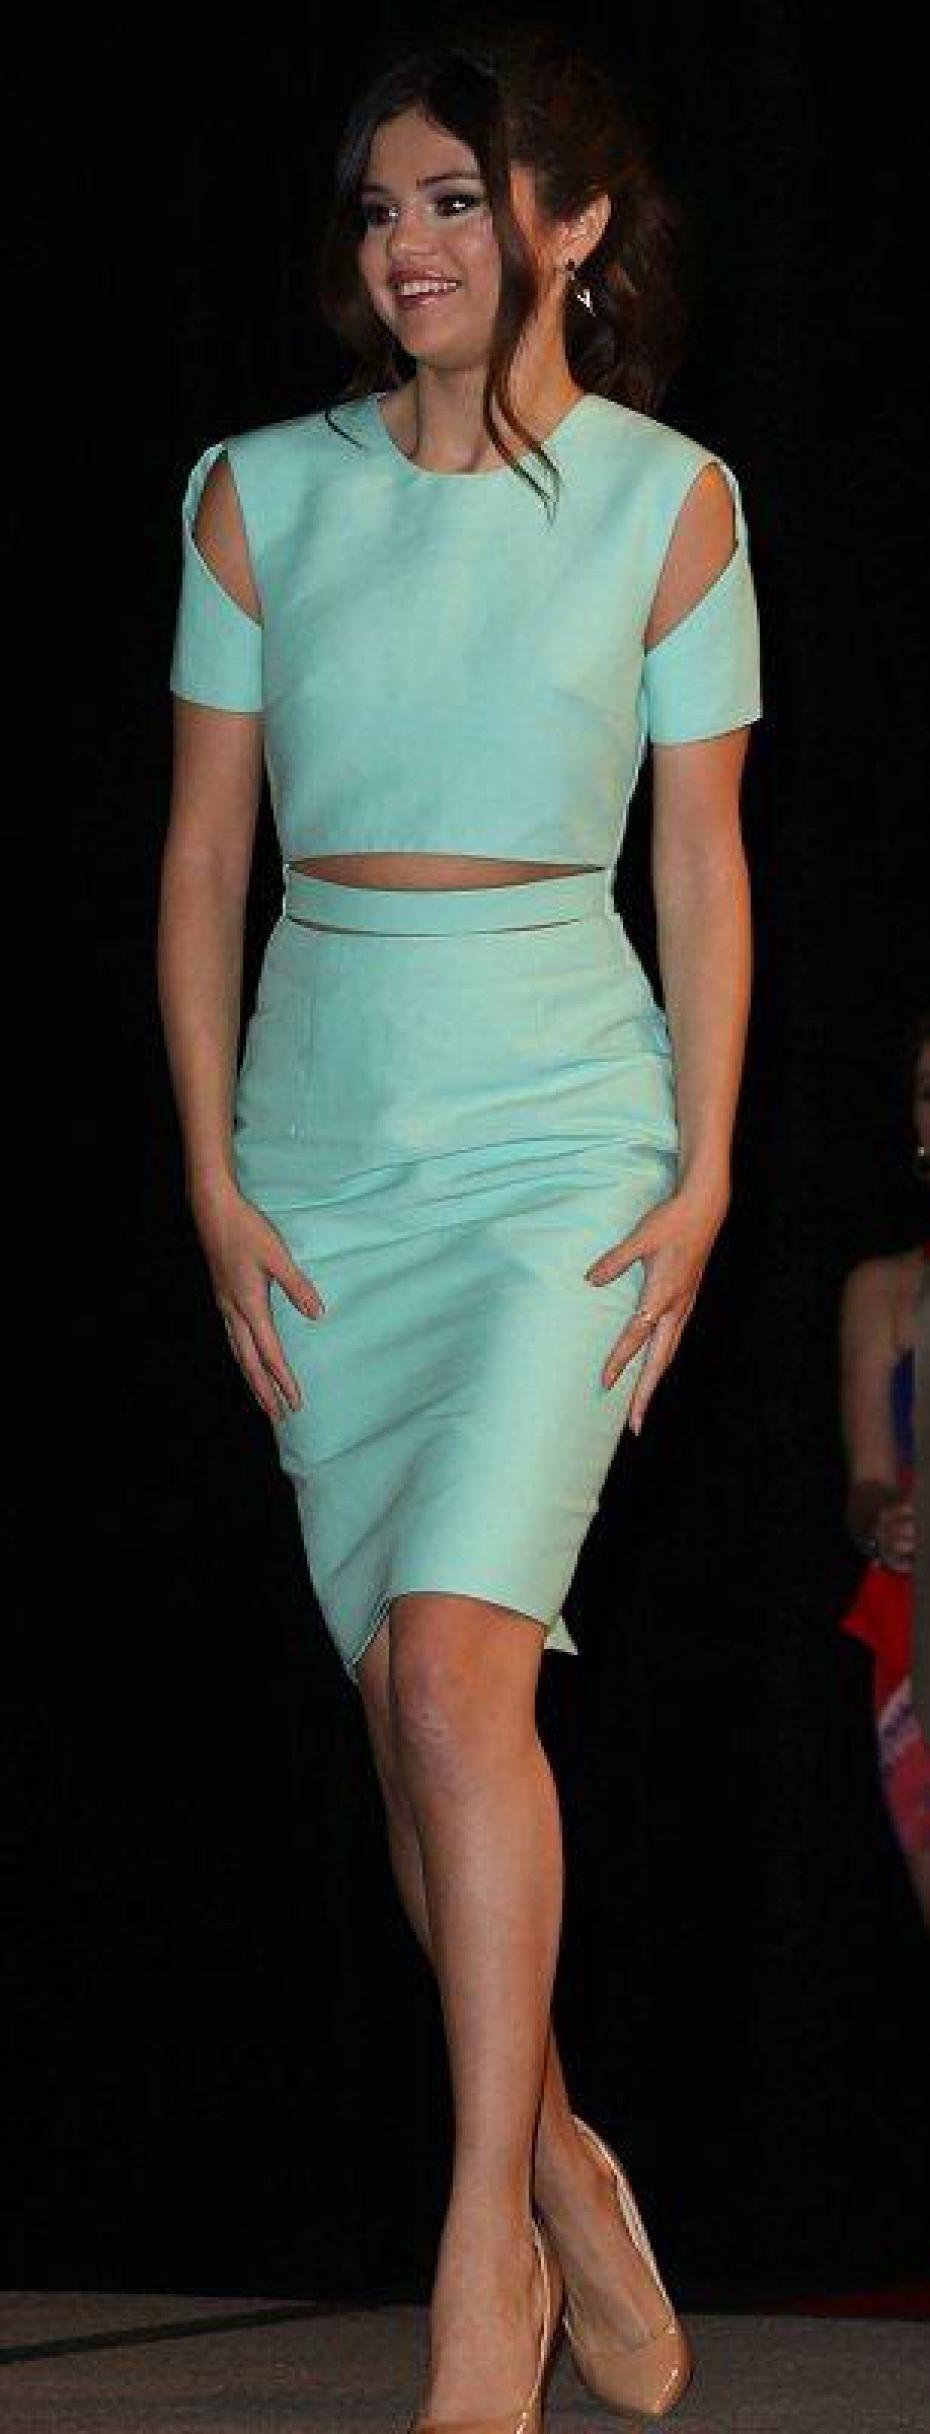 Selena Gomez, Spring Breakers cast-mates at the SXSW Film Festival event panel | Fashion in 2019 ...